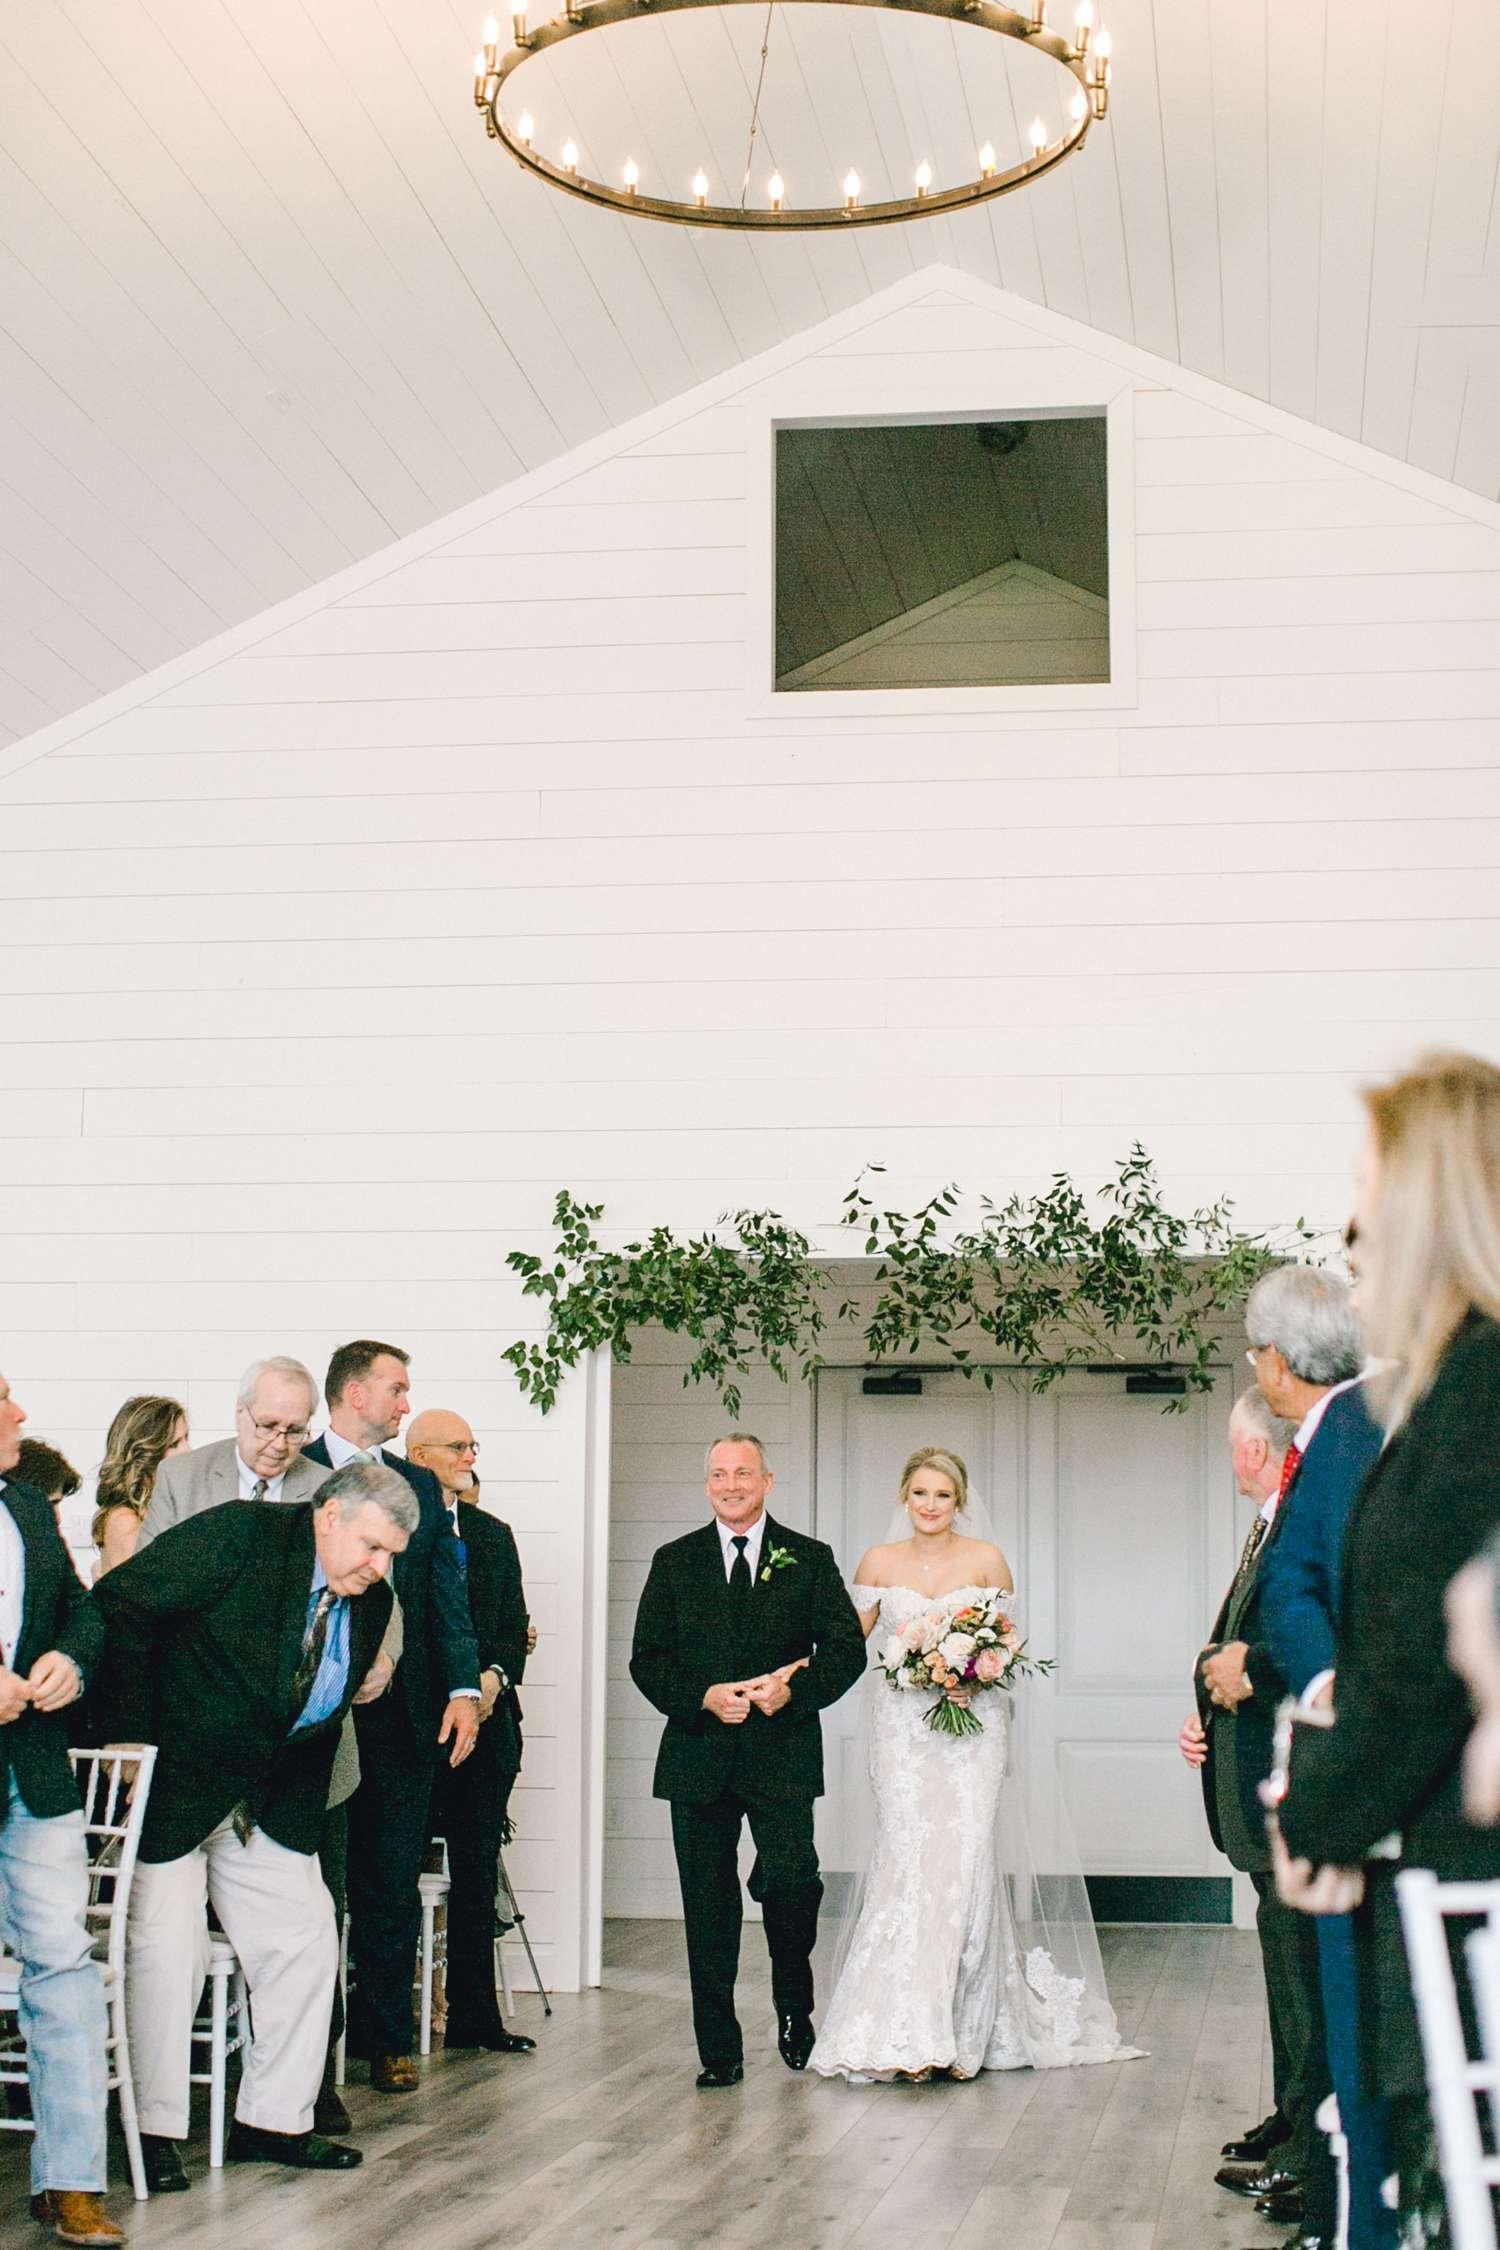 HEBERT_MORGAN_AND_CLAY_ALLEEJ_THE_FARMHOUSE_MONTGOMERY_TEXAS_WEDDING_0080.jpg